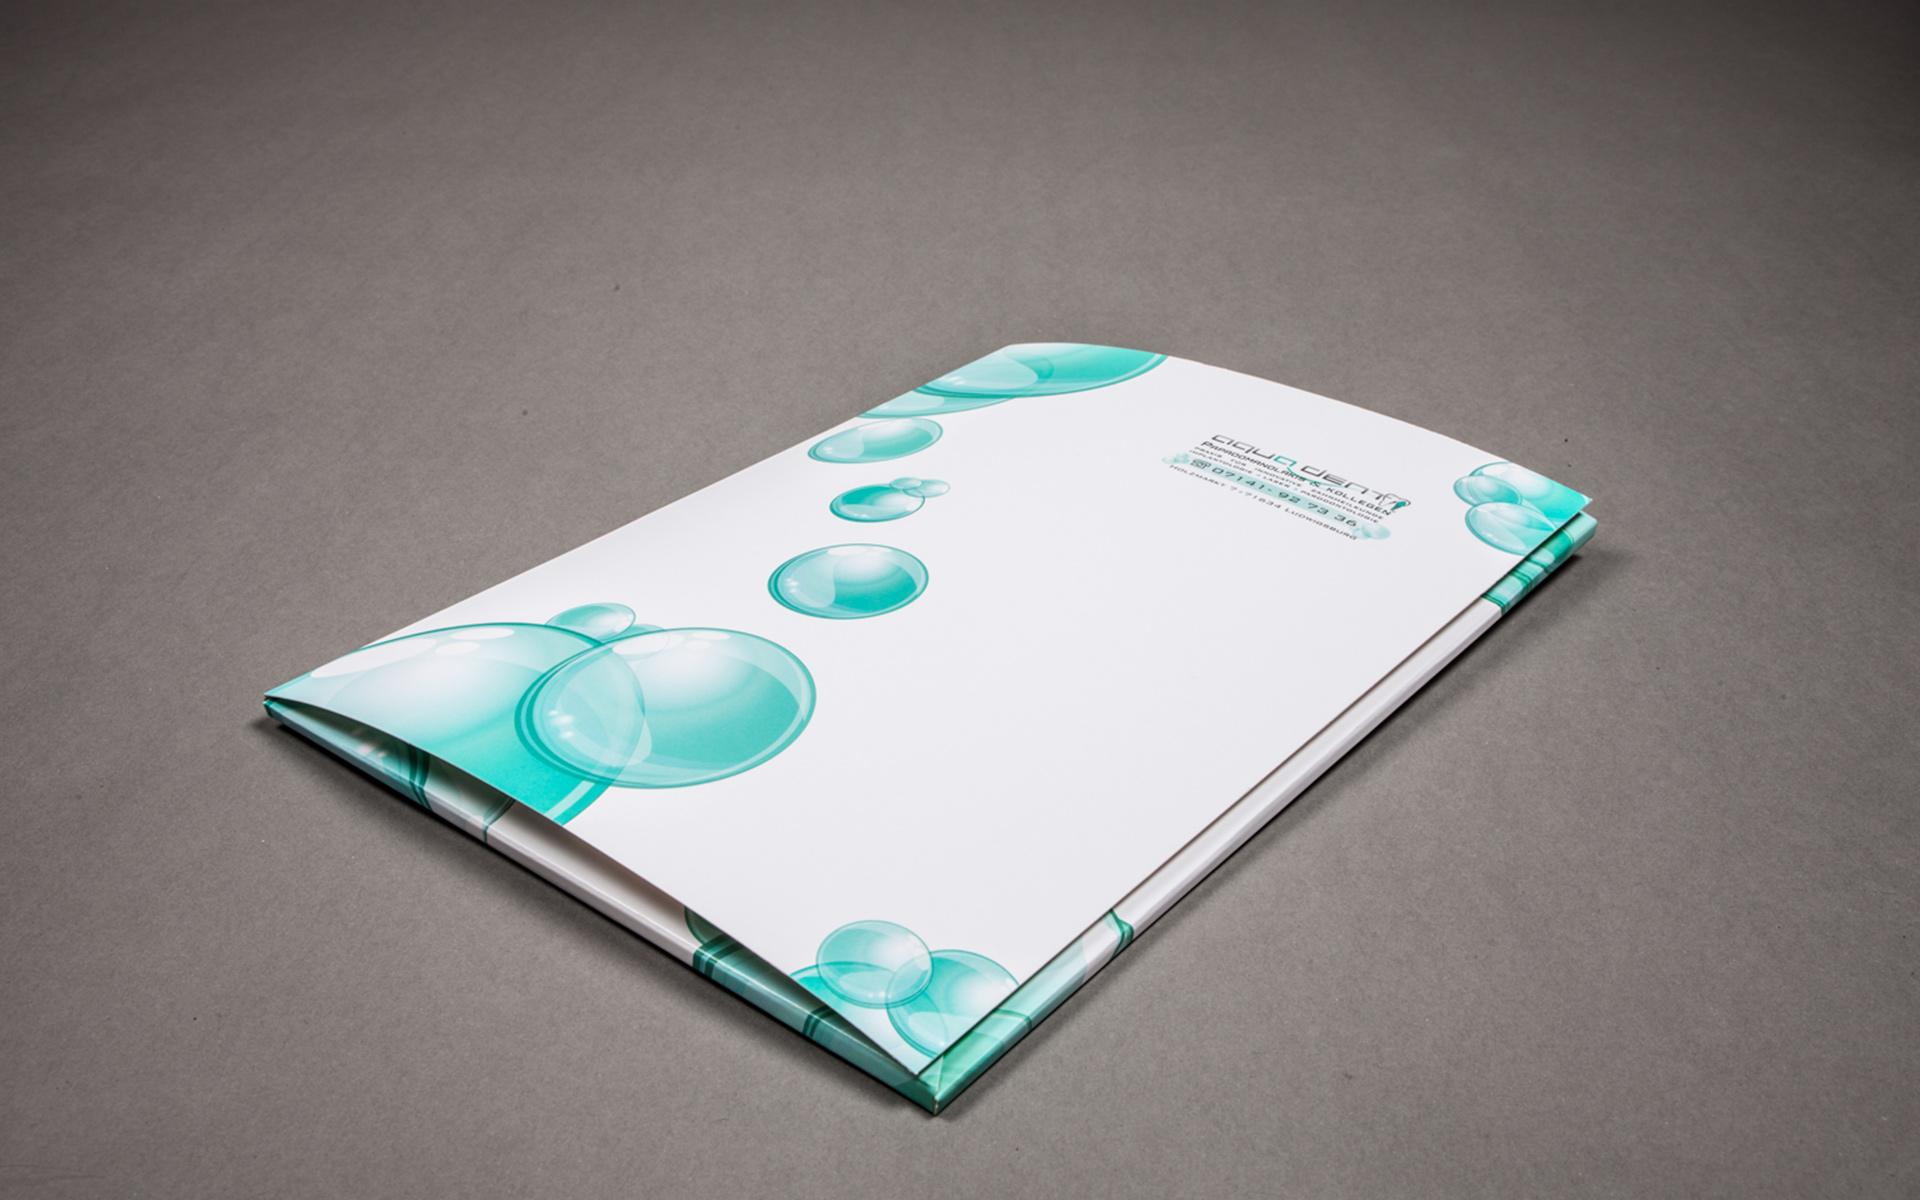 Angebotsmappen Arztpraxis, Visitenkarten Arztpraxis, Briefpapier Arztpraxis